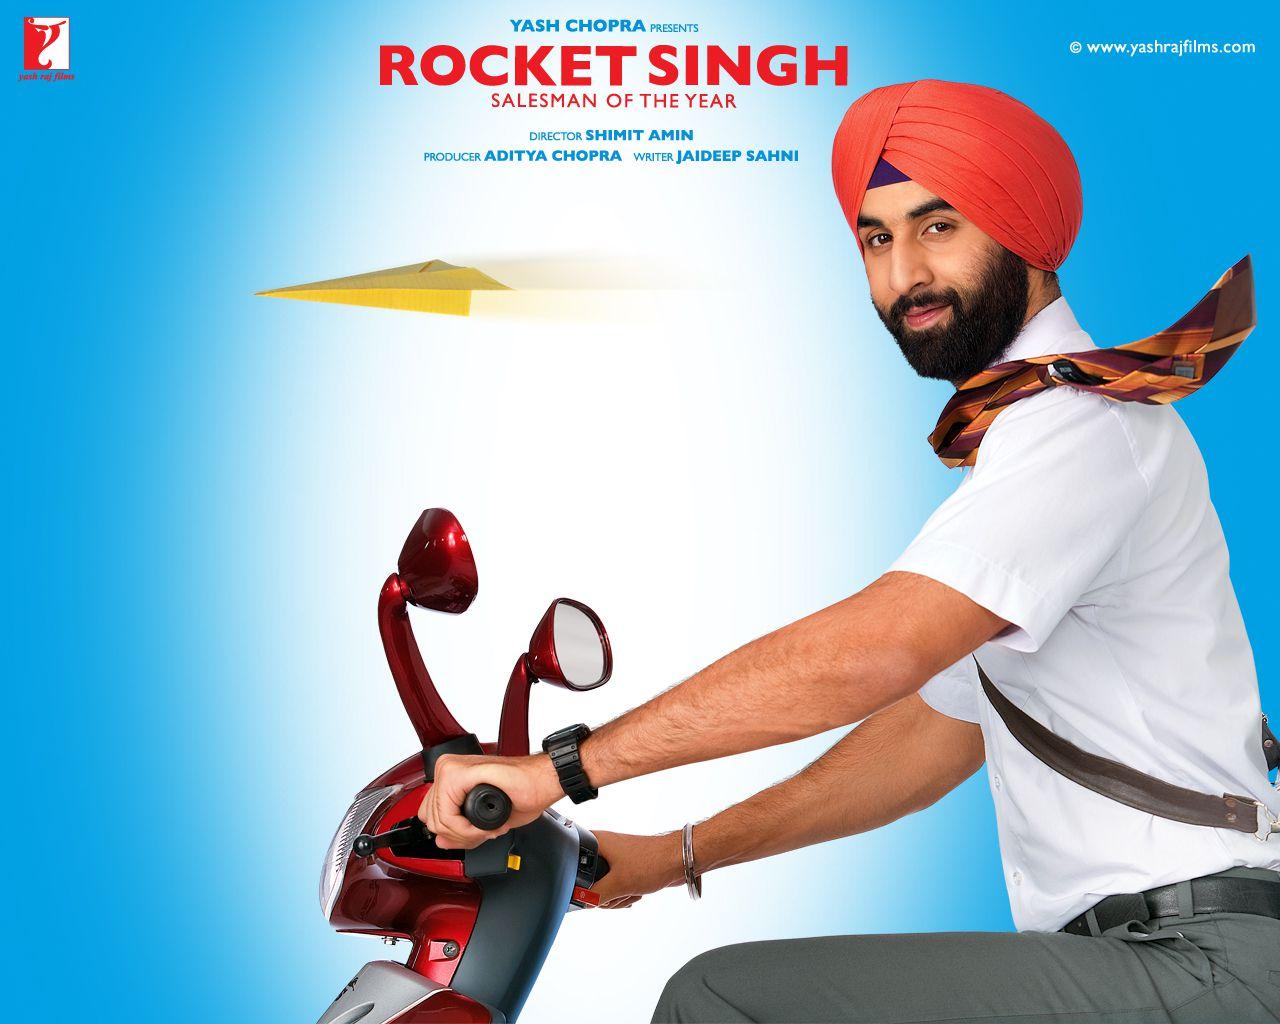 kinopoisk.ru-Rocket-Singh_3A-Salesman-of-the-Year-1177810--w--1280.jpg